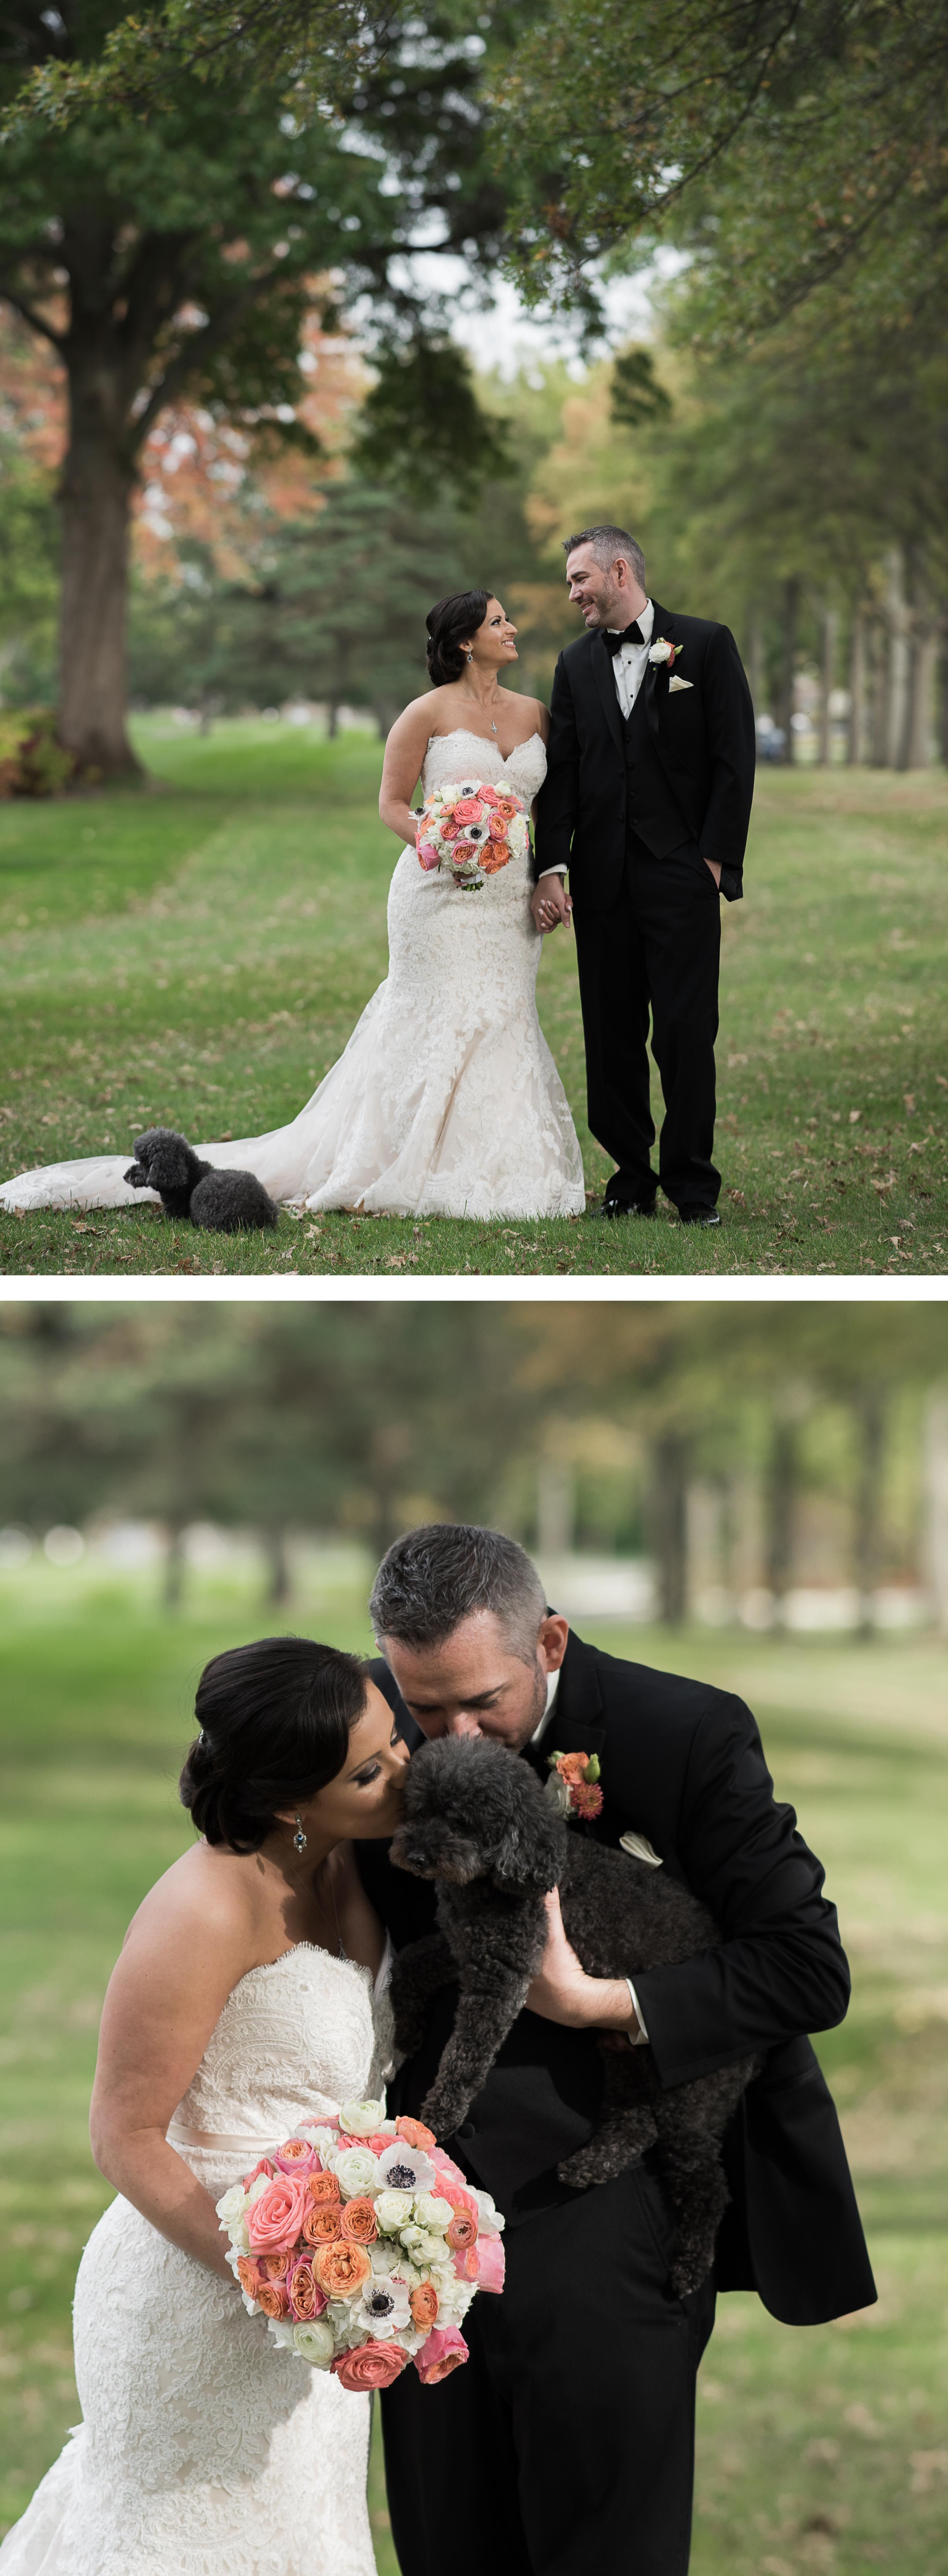 Columbus Wedding Photographer, Columbus Wedding Photography, Ohio Wedding Photographers, Brett Loves Elle, Bride and Groom